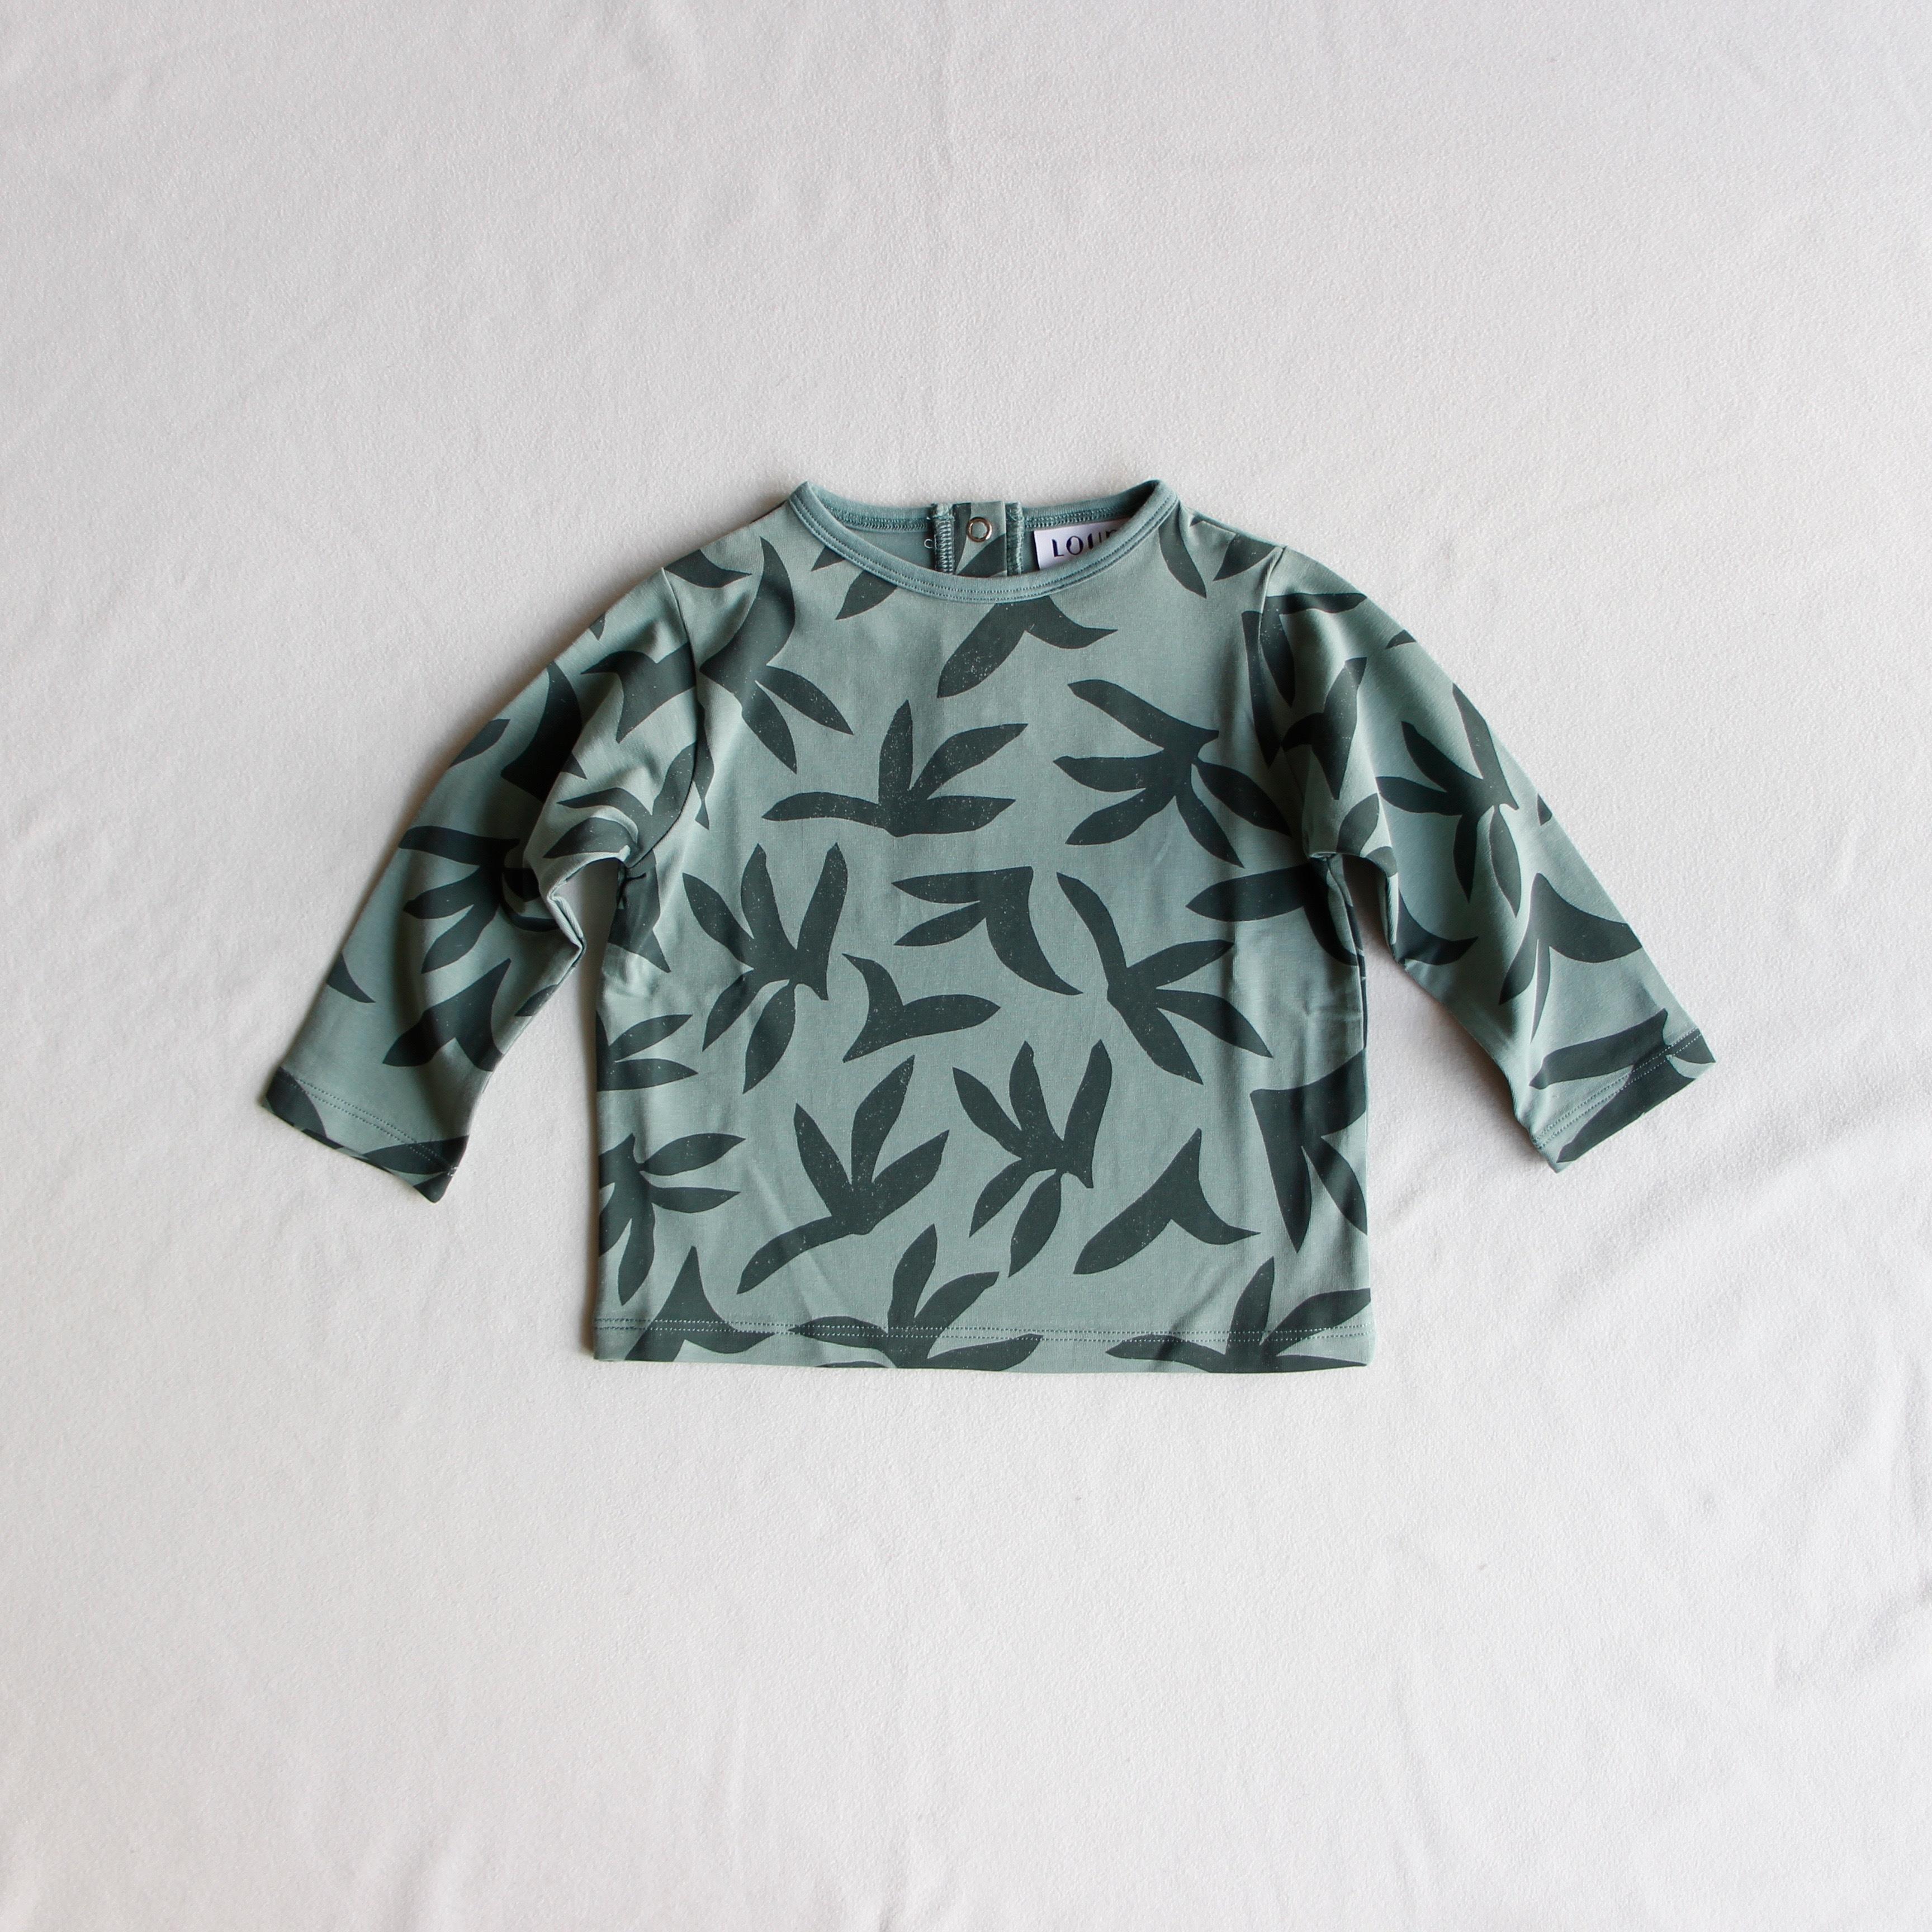 《LOUP 2018AW》Teeshirt FEUIL / green